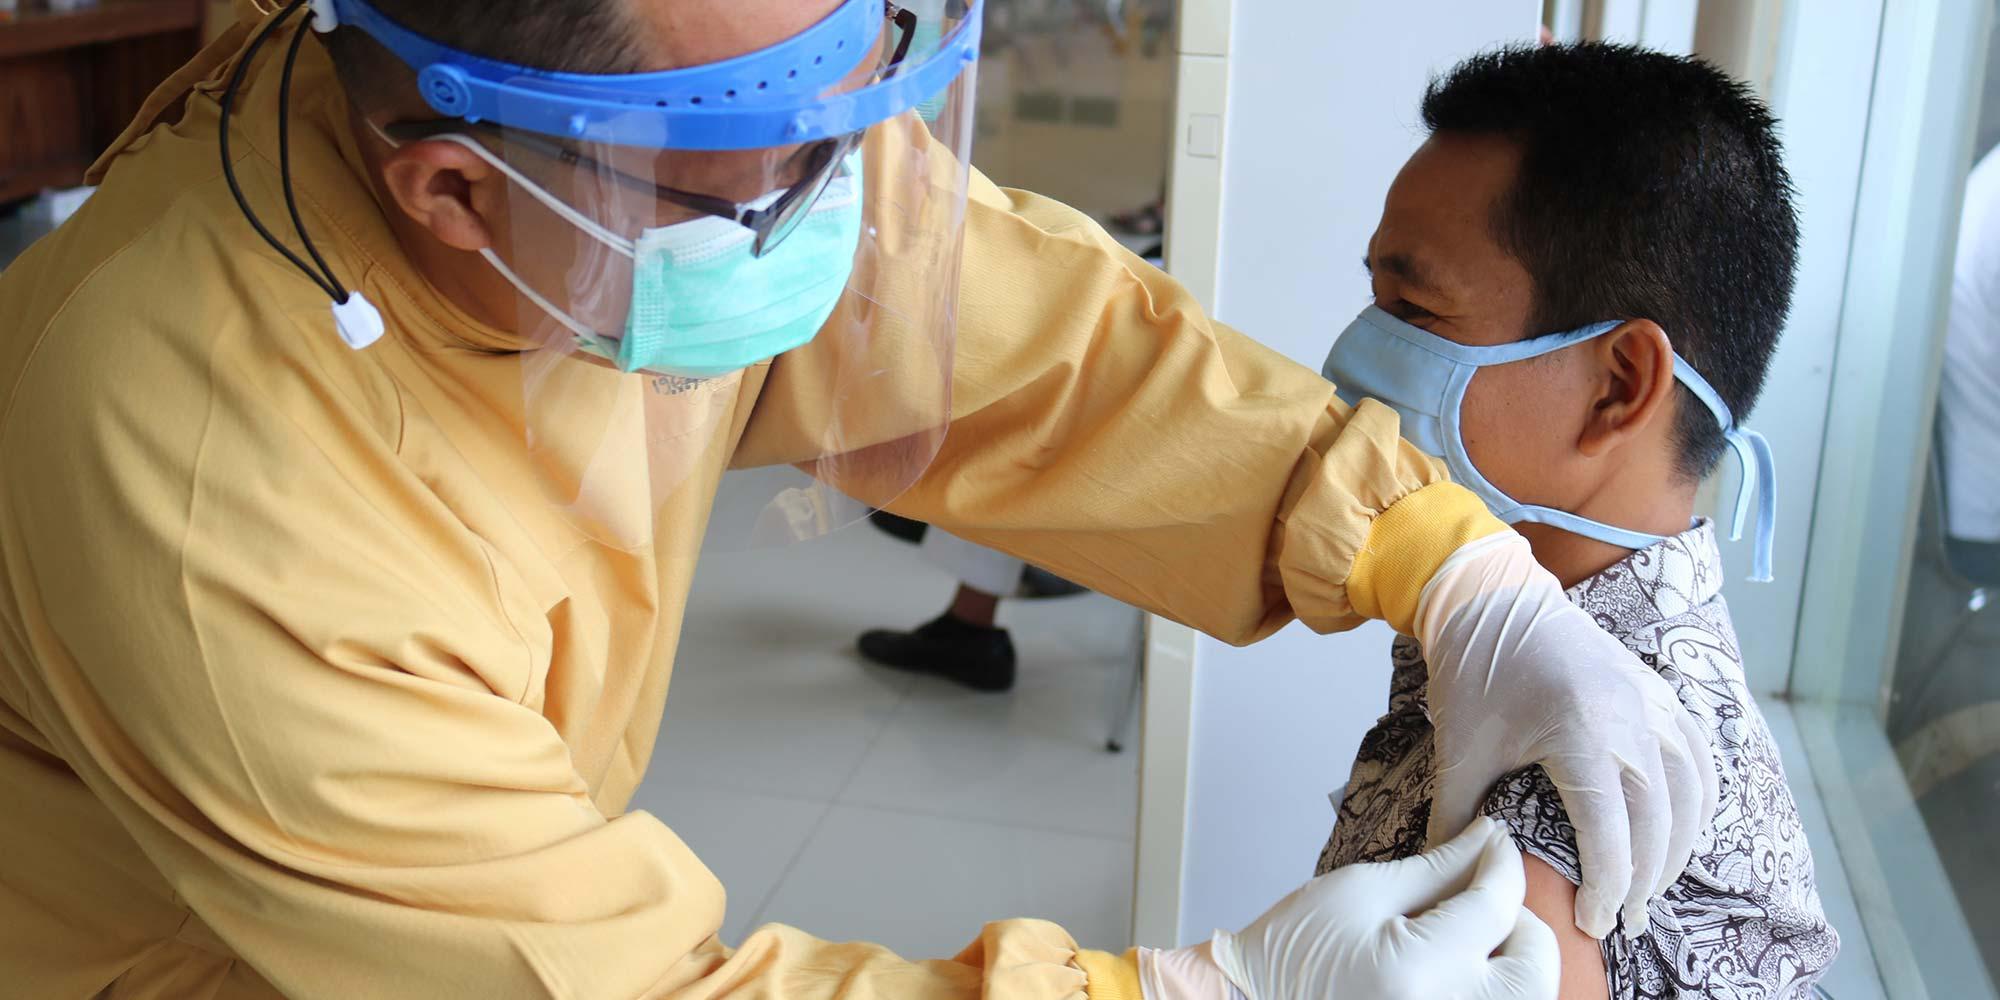 Menkes Kejar Vaksinasi Covid-19 Selesai Awal Tahun Depan